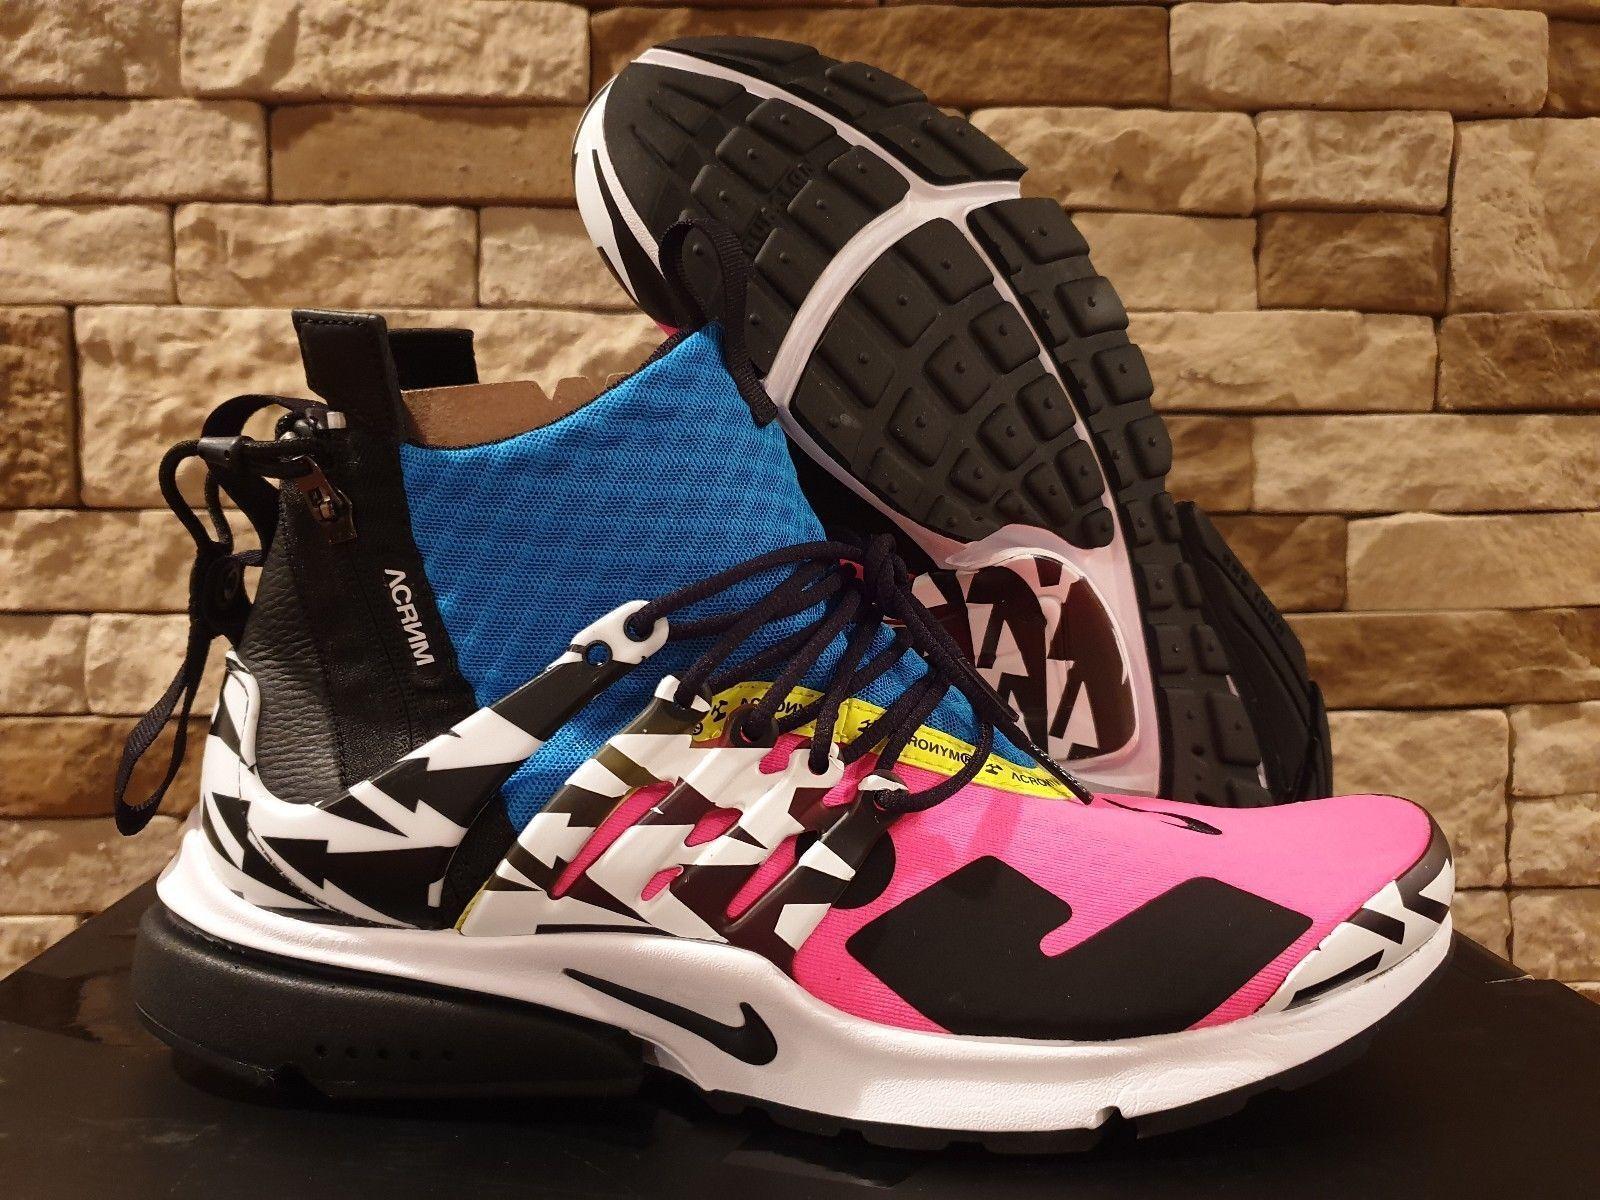 Acrónimo X Nike Aire Presto Mid 4-14 Racer rose noir bleu Ah7832-600